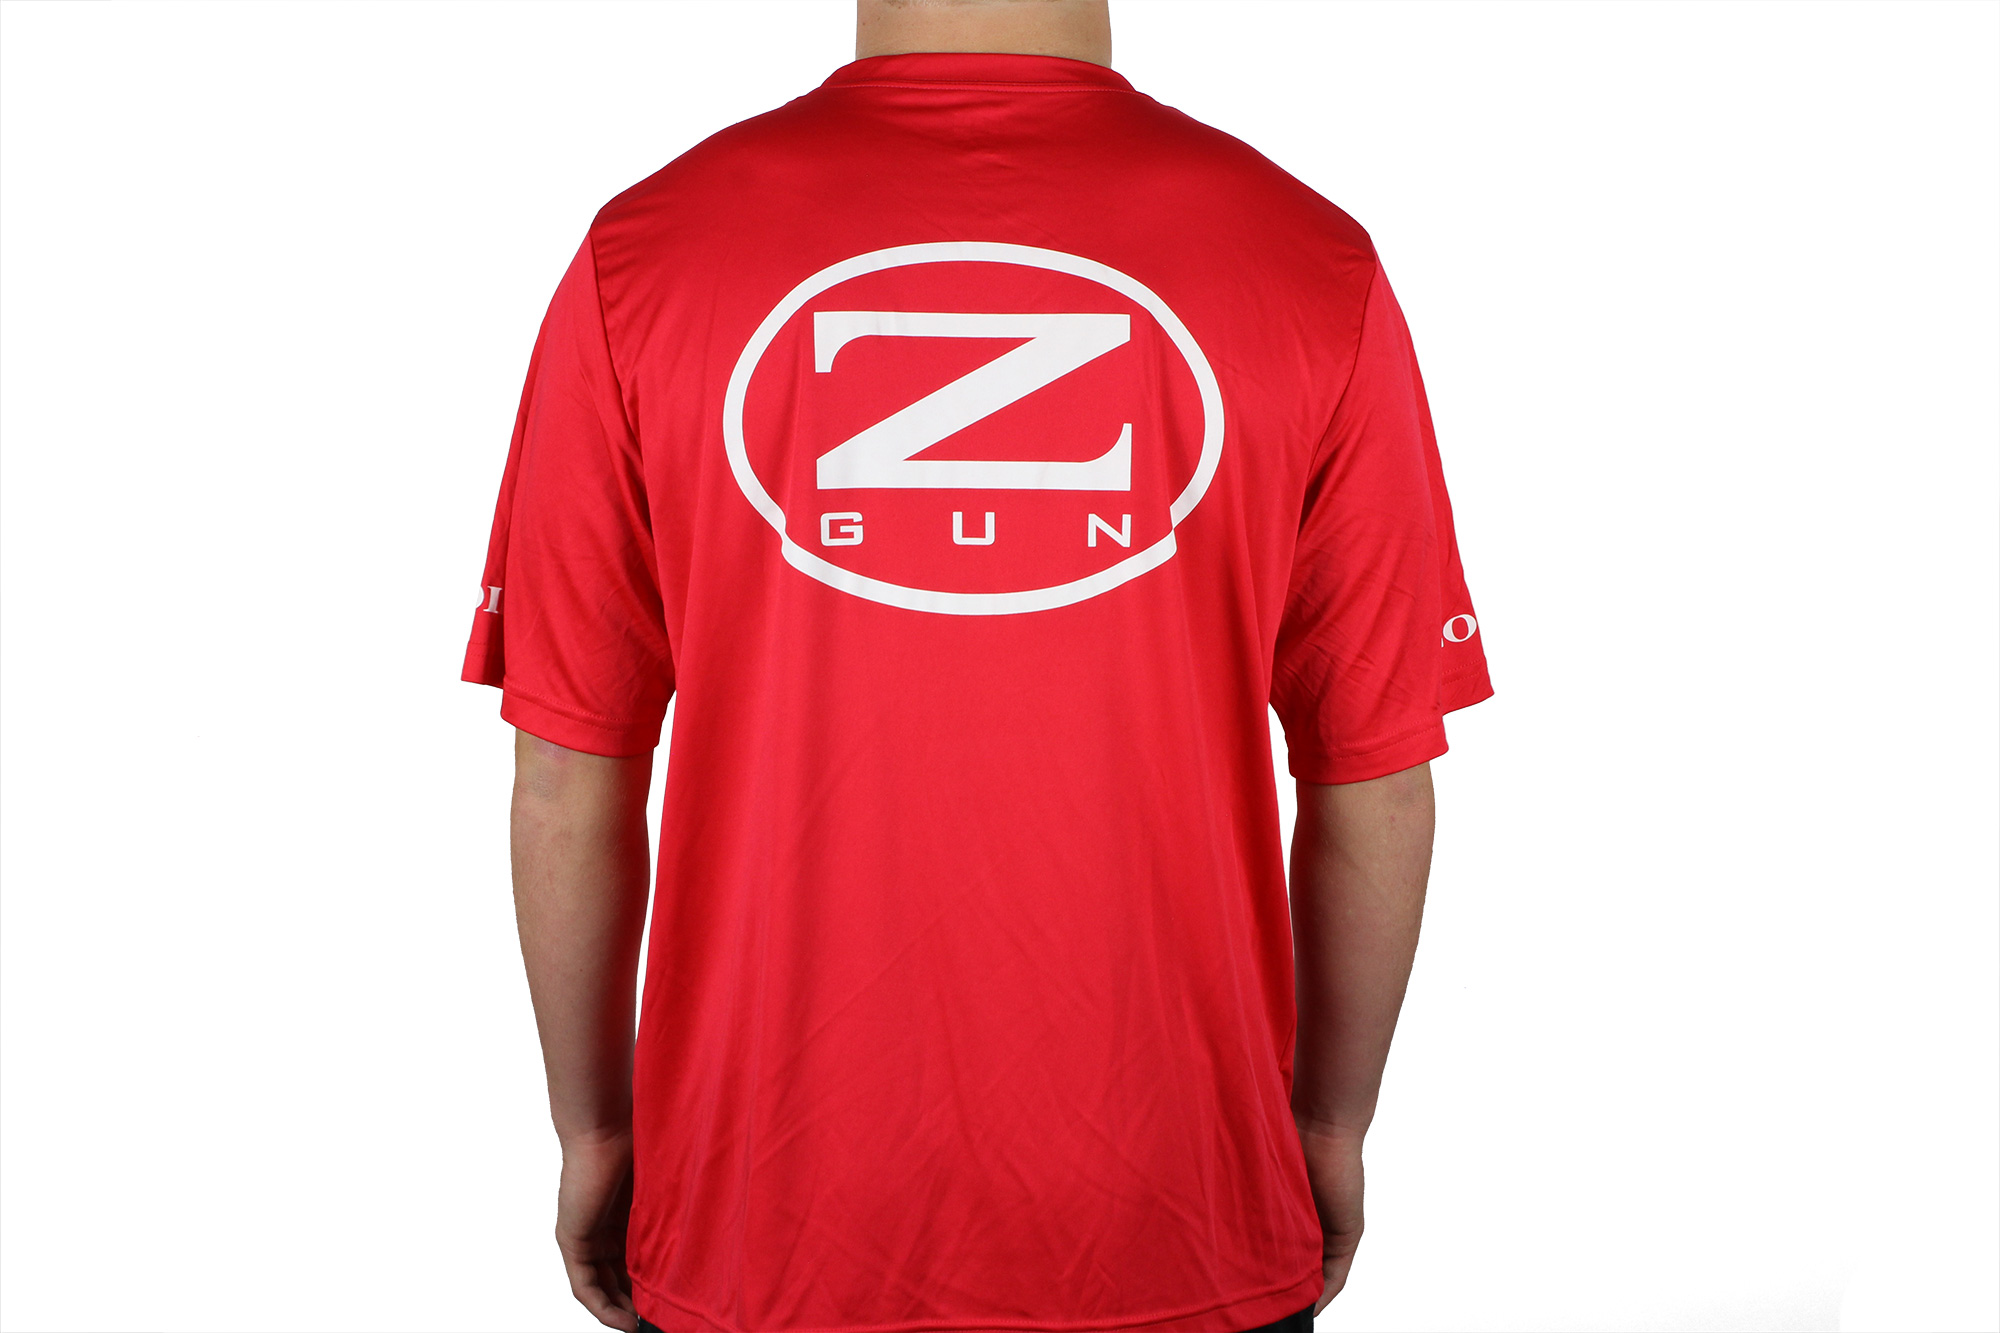 Zoli Z-GUN Red Sport Shirt back